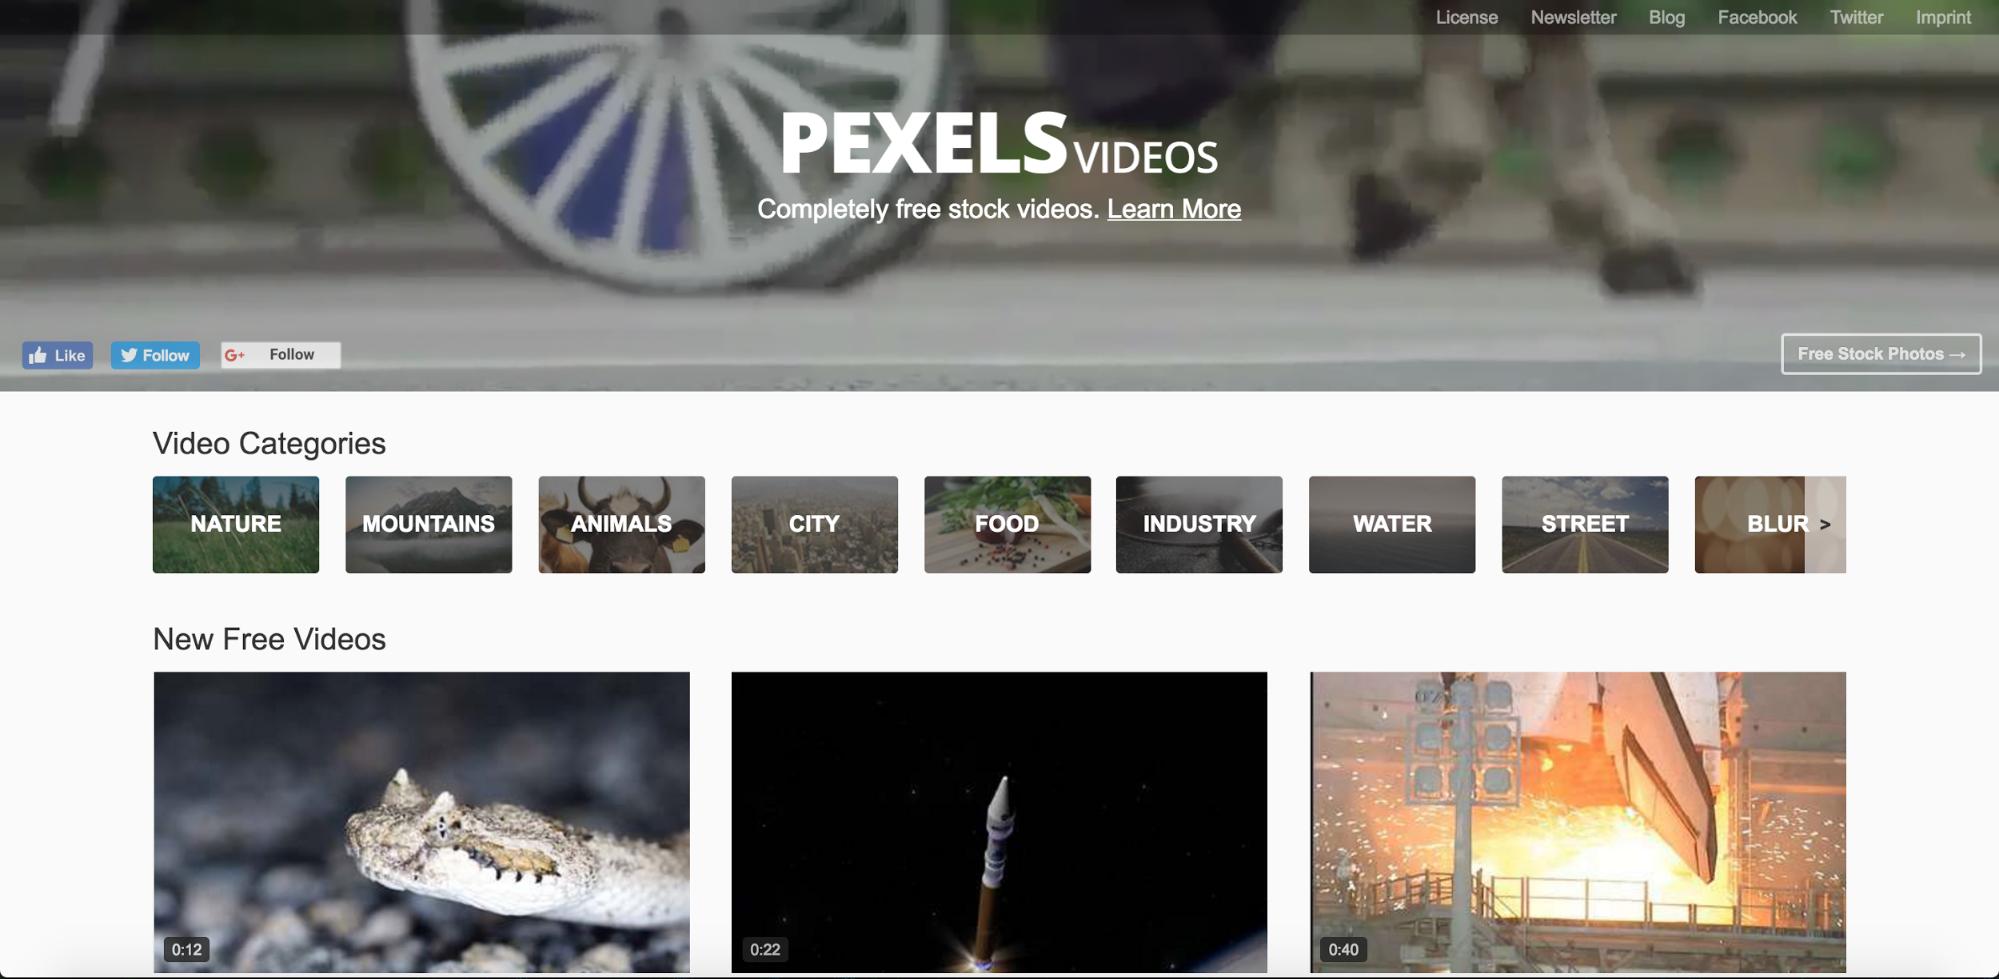 Pexels Videos hosts completely free stock videos